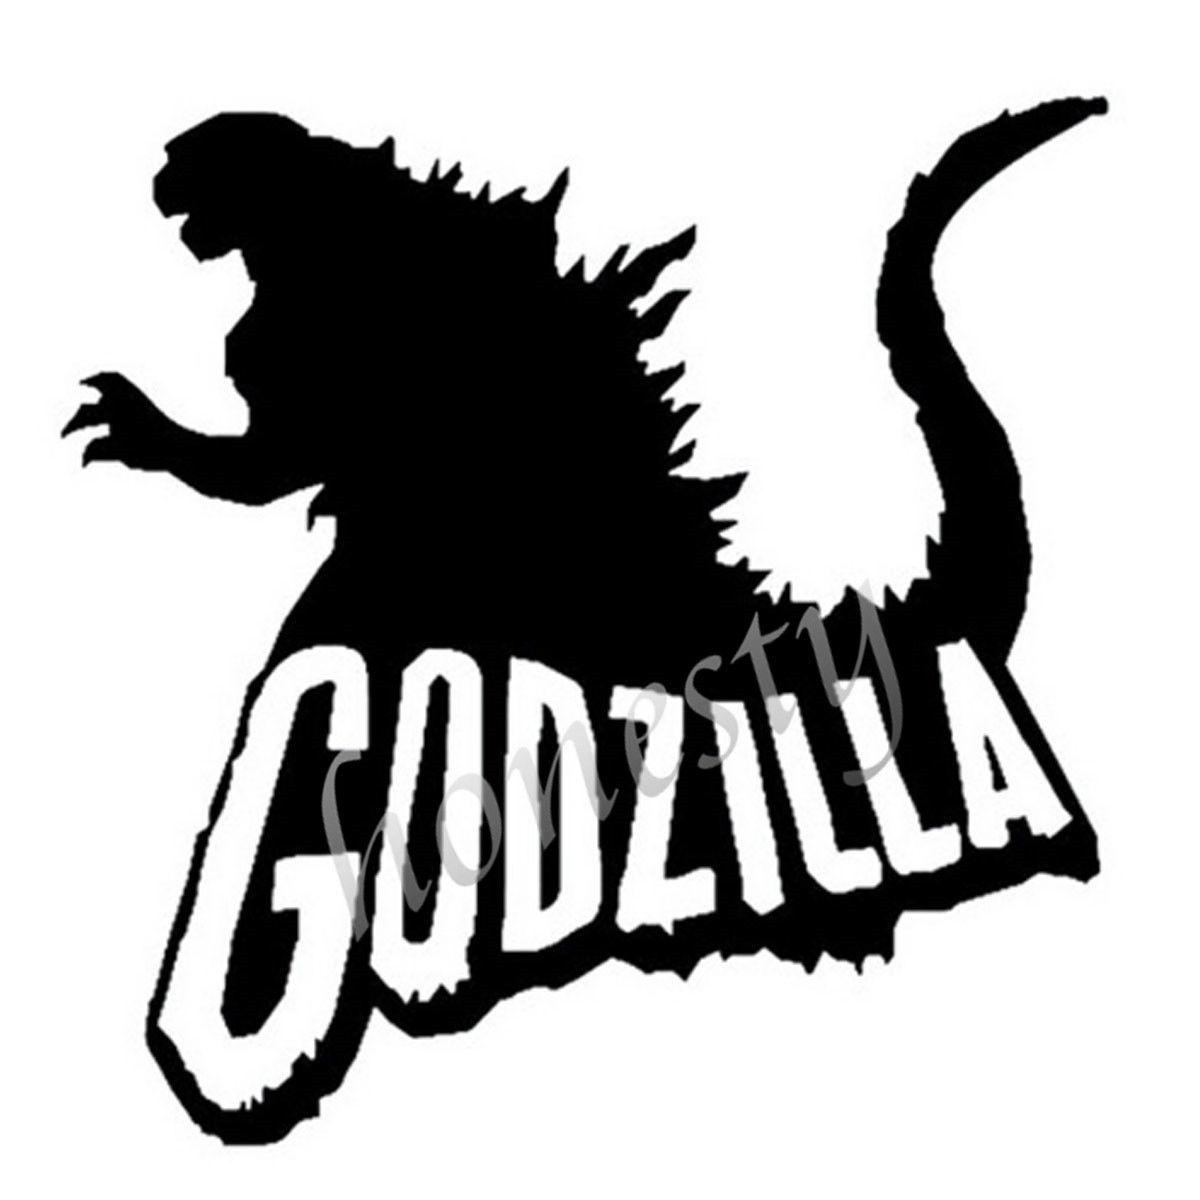 Godzilla clipart black and white Black Decal  Film Popular